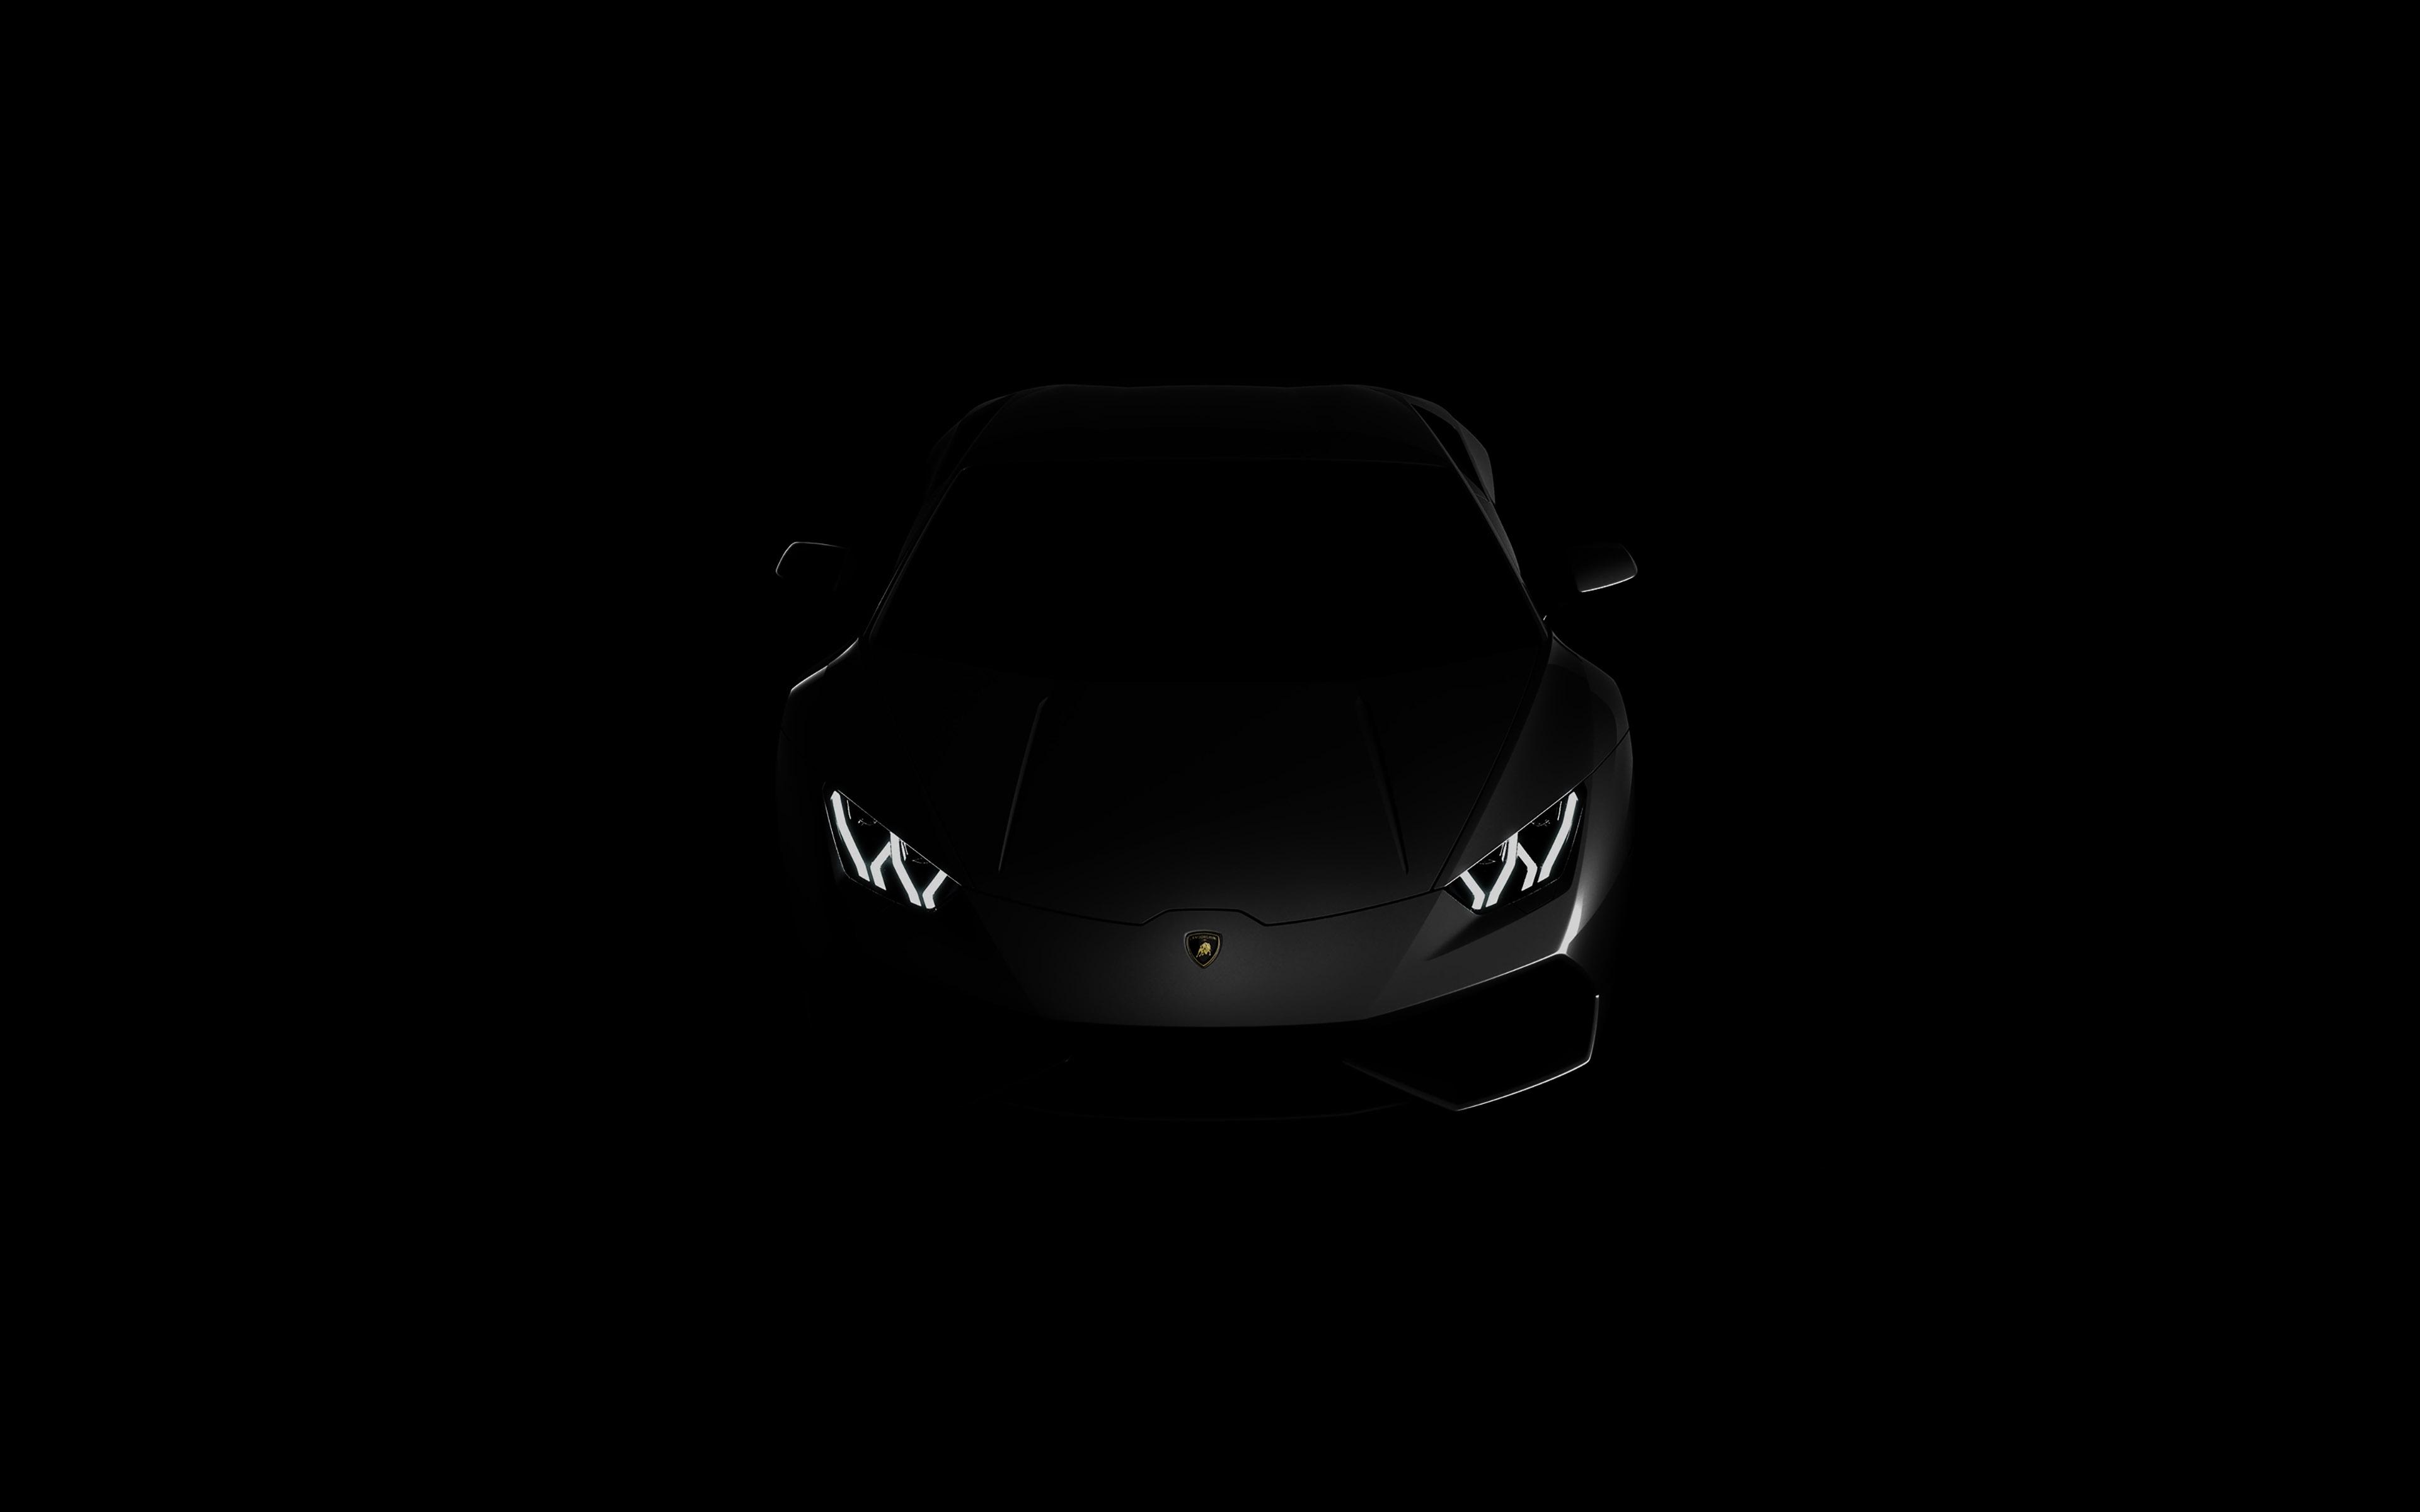 Lamborghini huracan lp black dark 4k wallpaper View HD 3840x2400